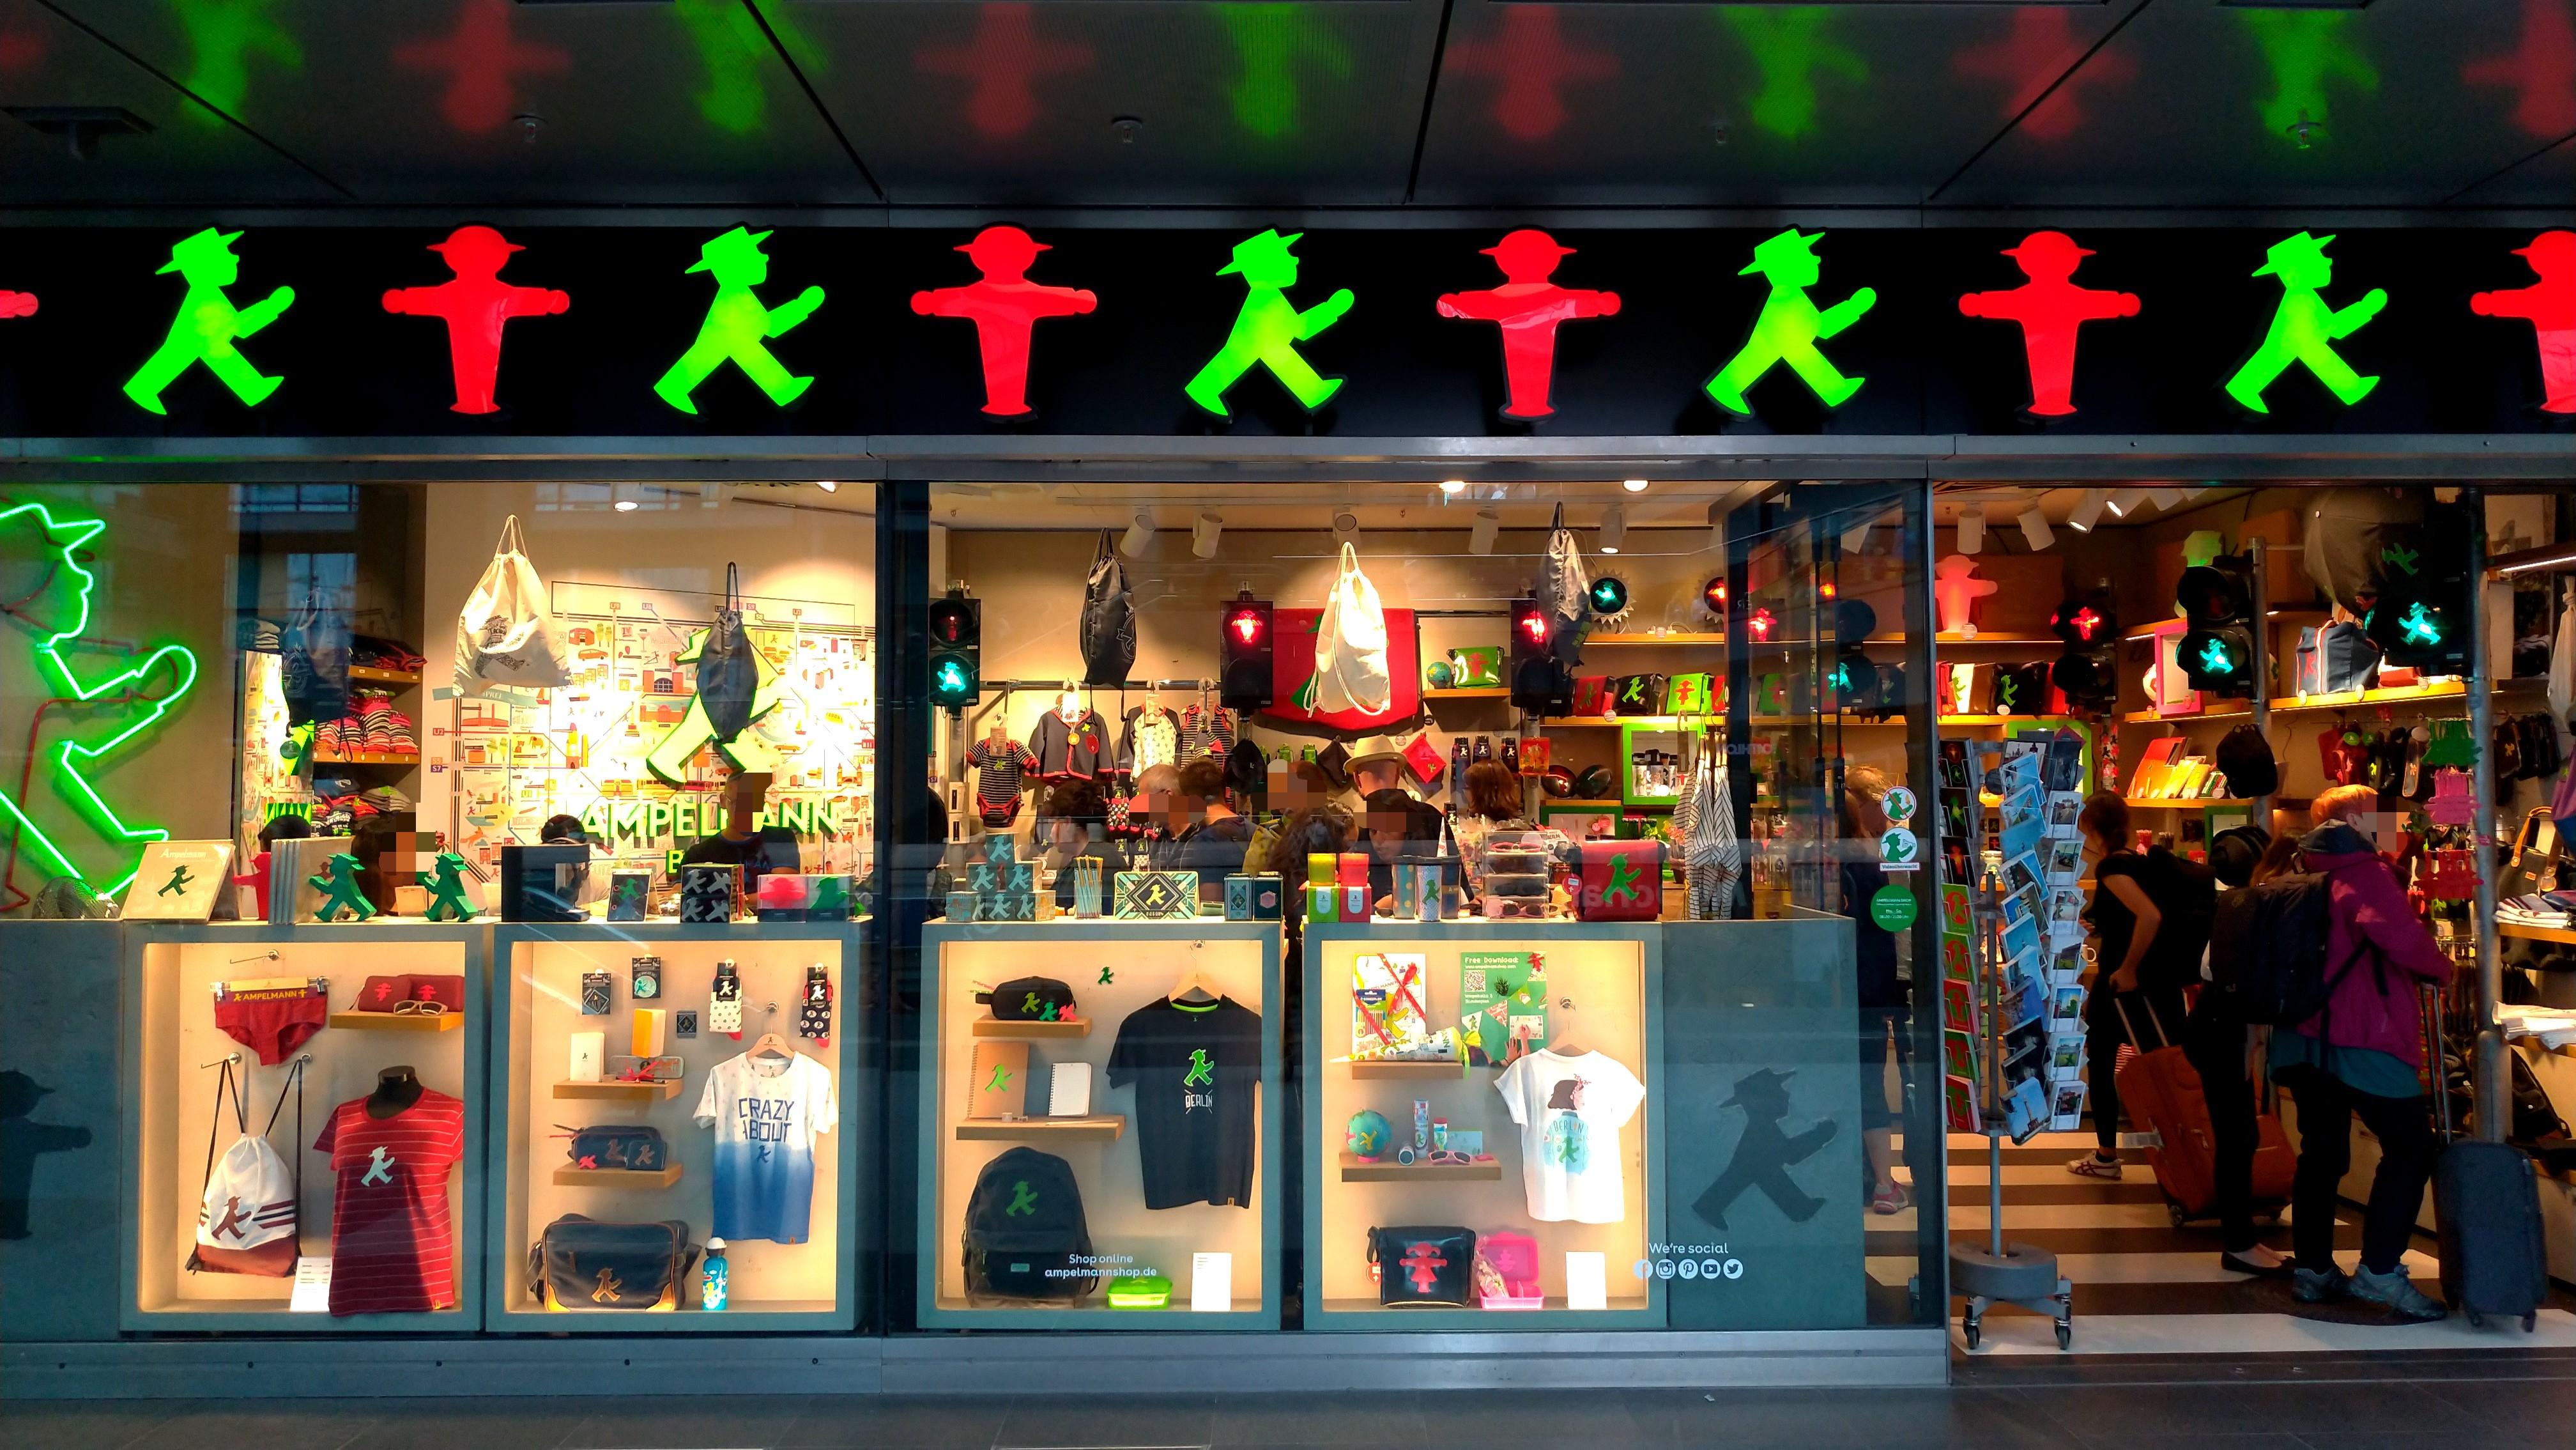 Ampelmann Shop Berlin Hbf アンペルマンショップ ベルリン中央駅店